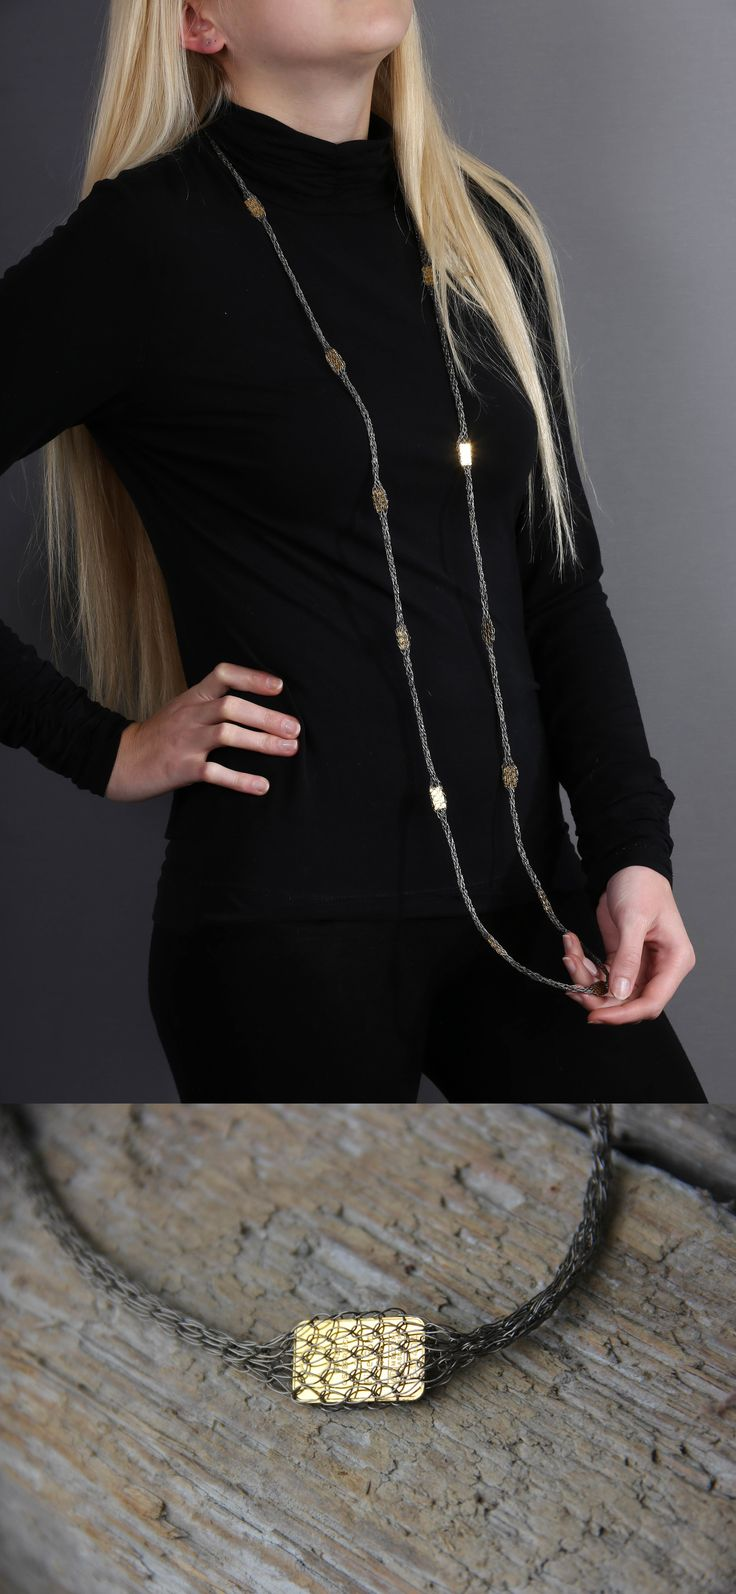 Kette, handgestrickt aus Titandraht mit Goldbarren www.atelier-zellhuber.de